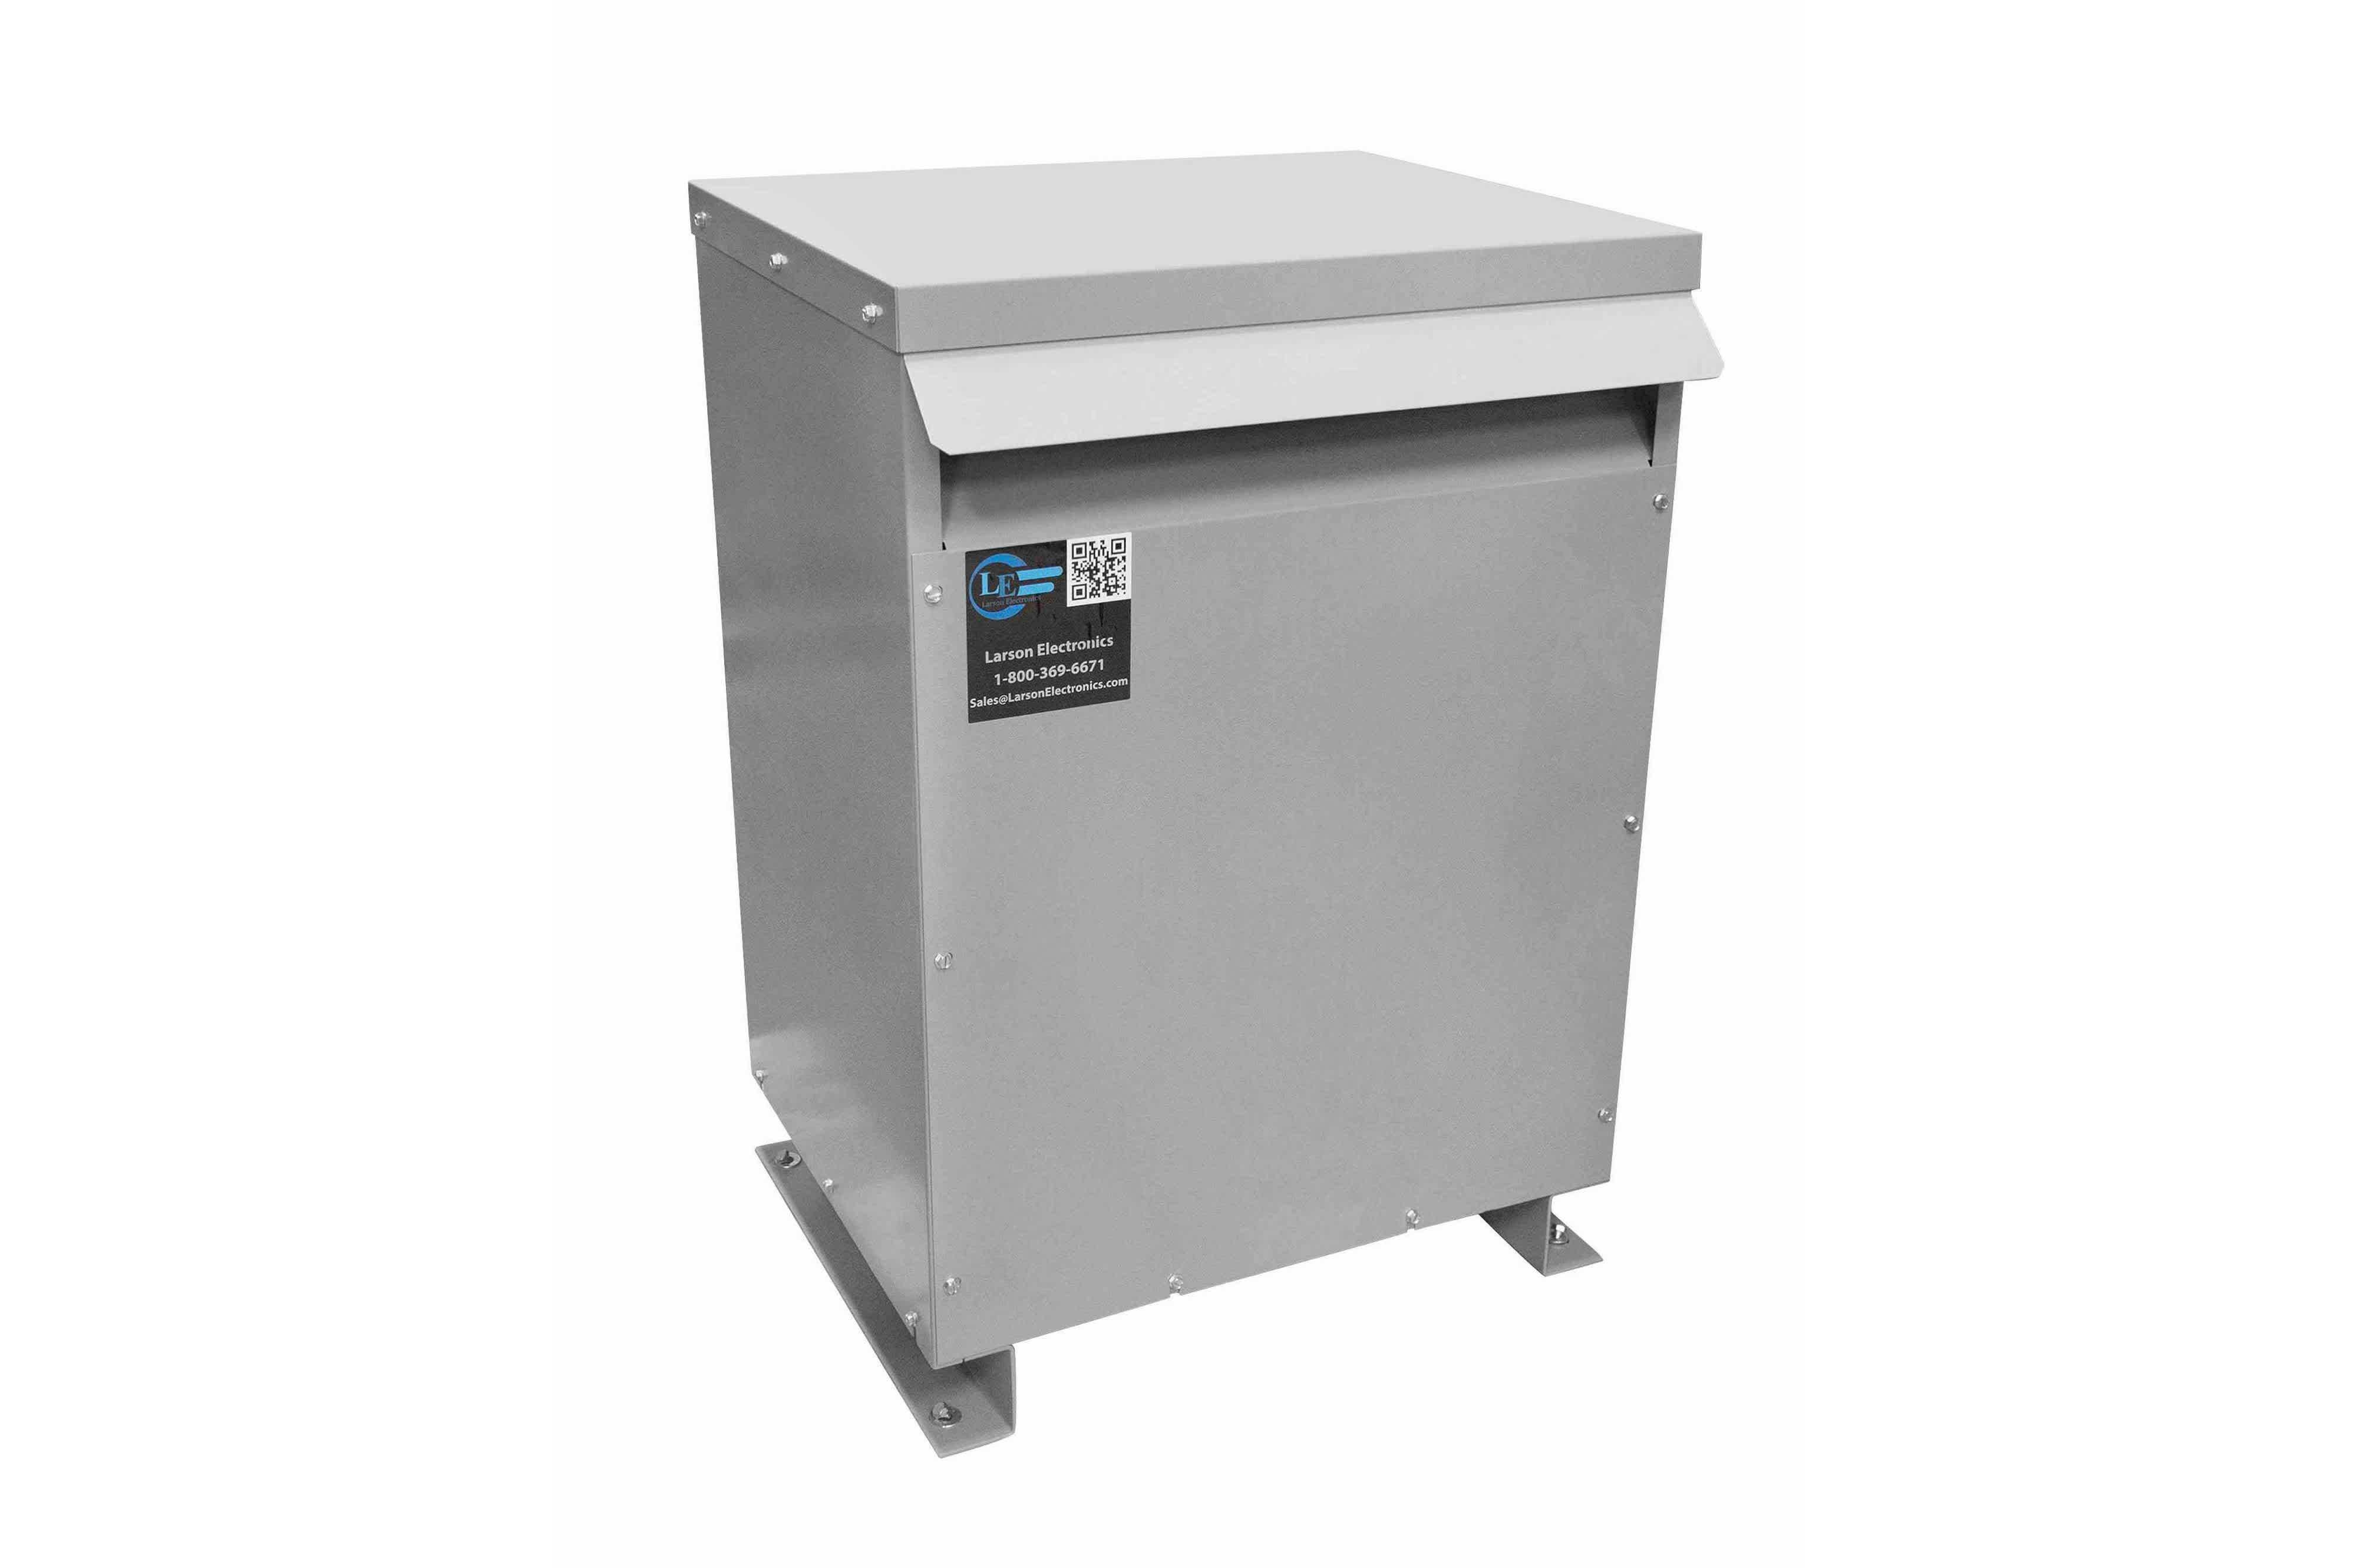 32.5 kVA 3PH Isolation Transformer, 460V Wye Primary, 400Y/231 Wye-N Secondary, N3R, Ventilated, 60 Hz